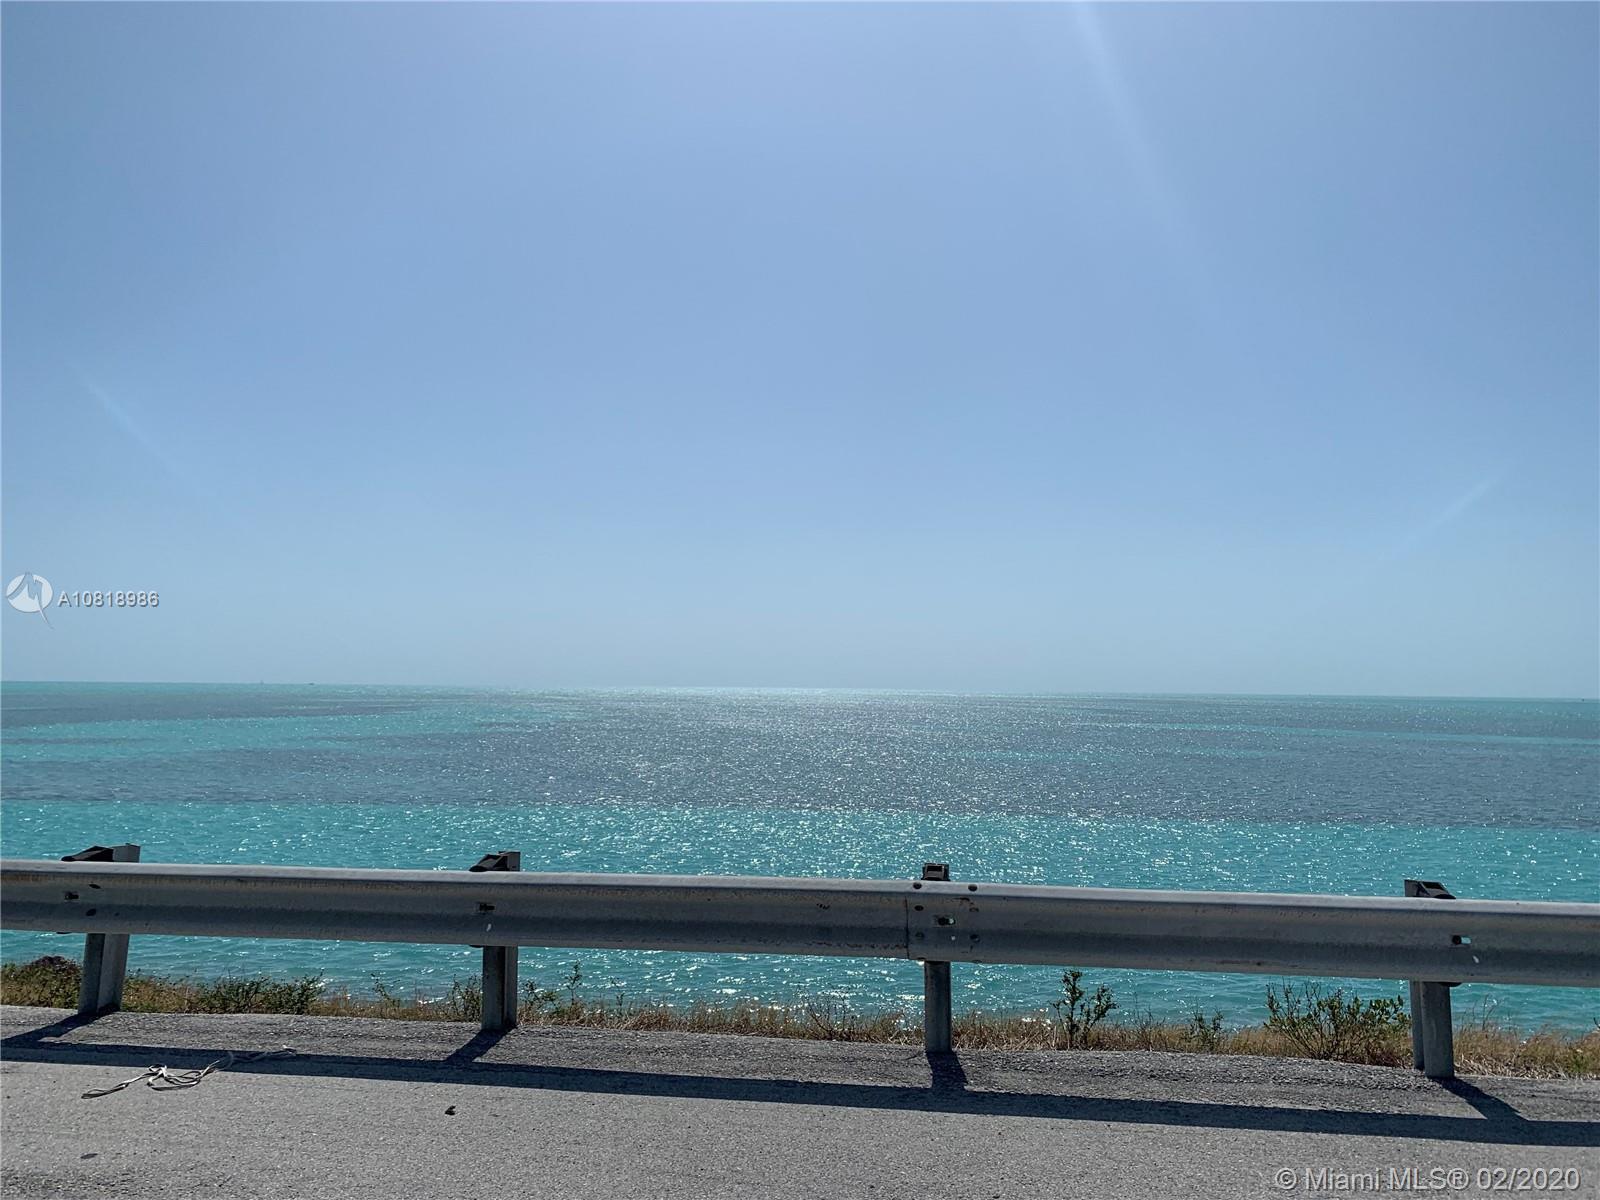 Beautiful drive to Florida Keys!